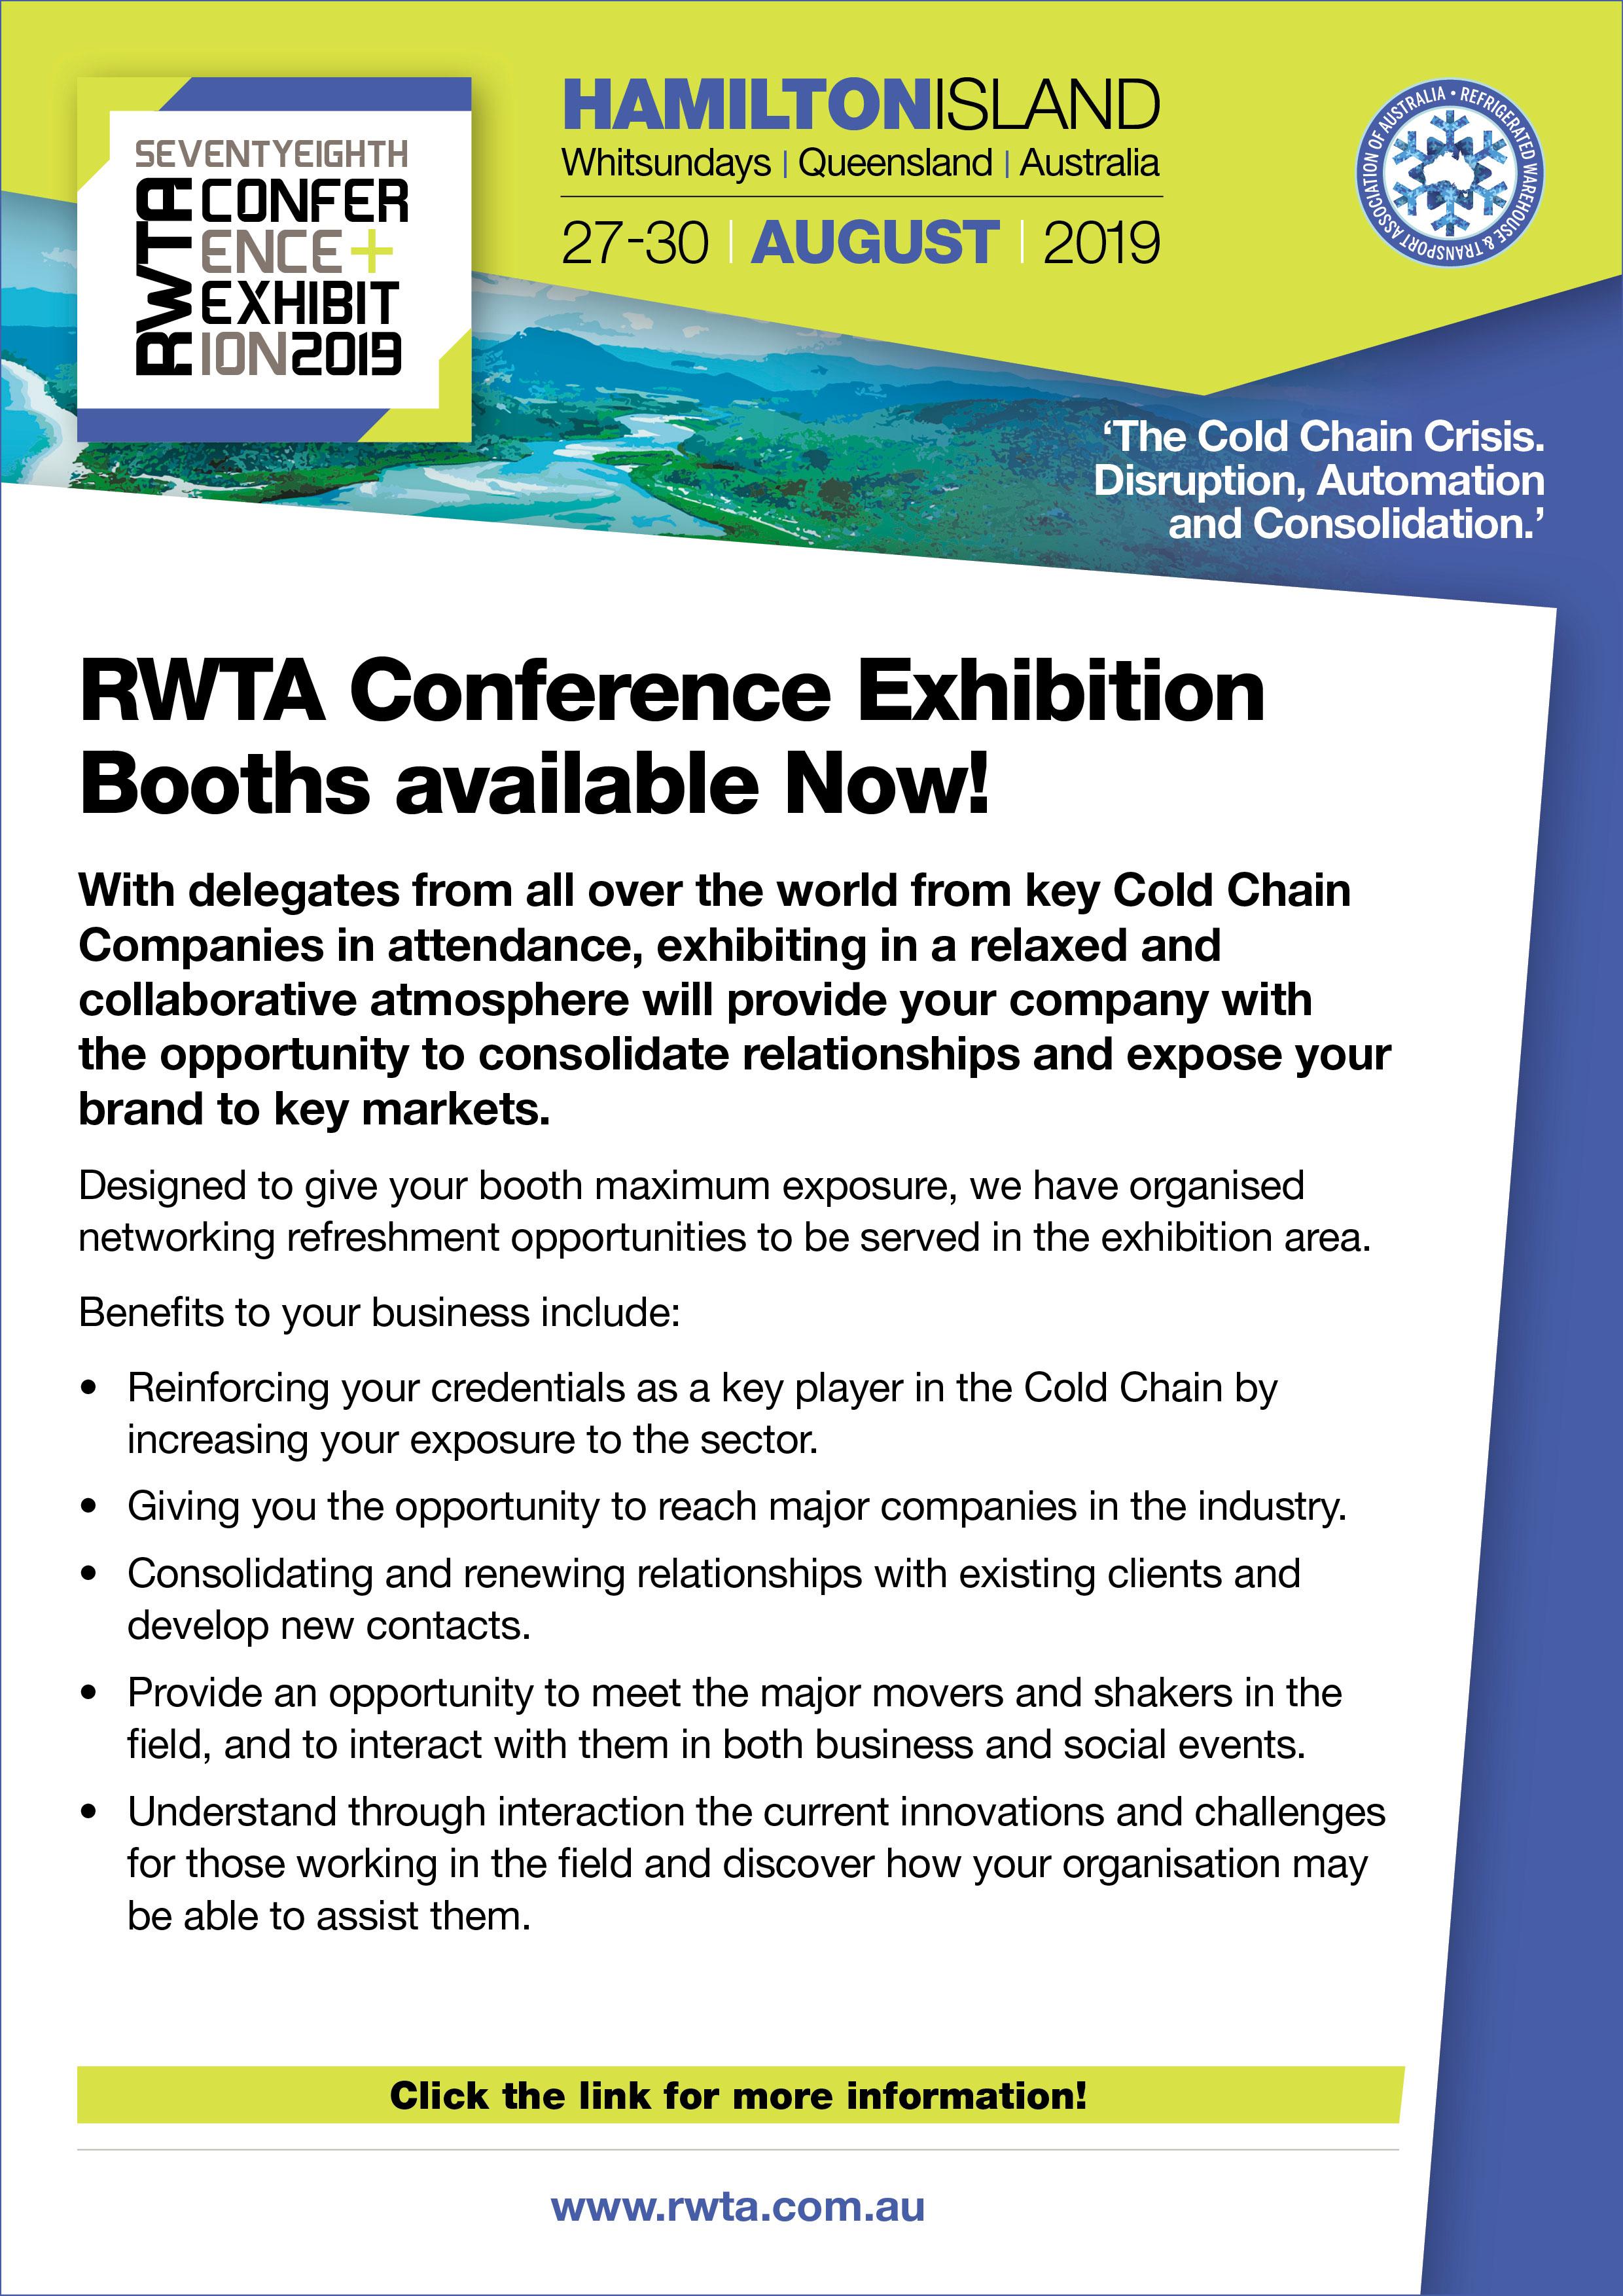 12510_RWTA_Con-Exhibit-Booths_F.jpg